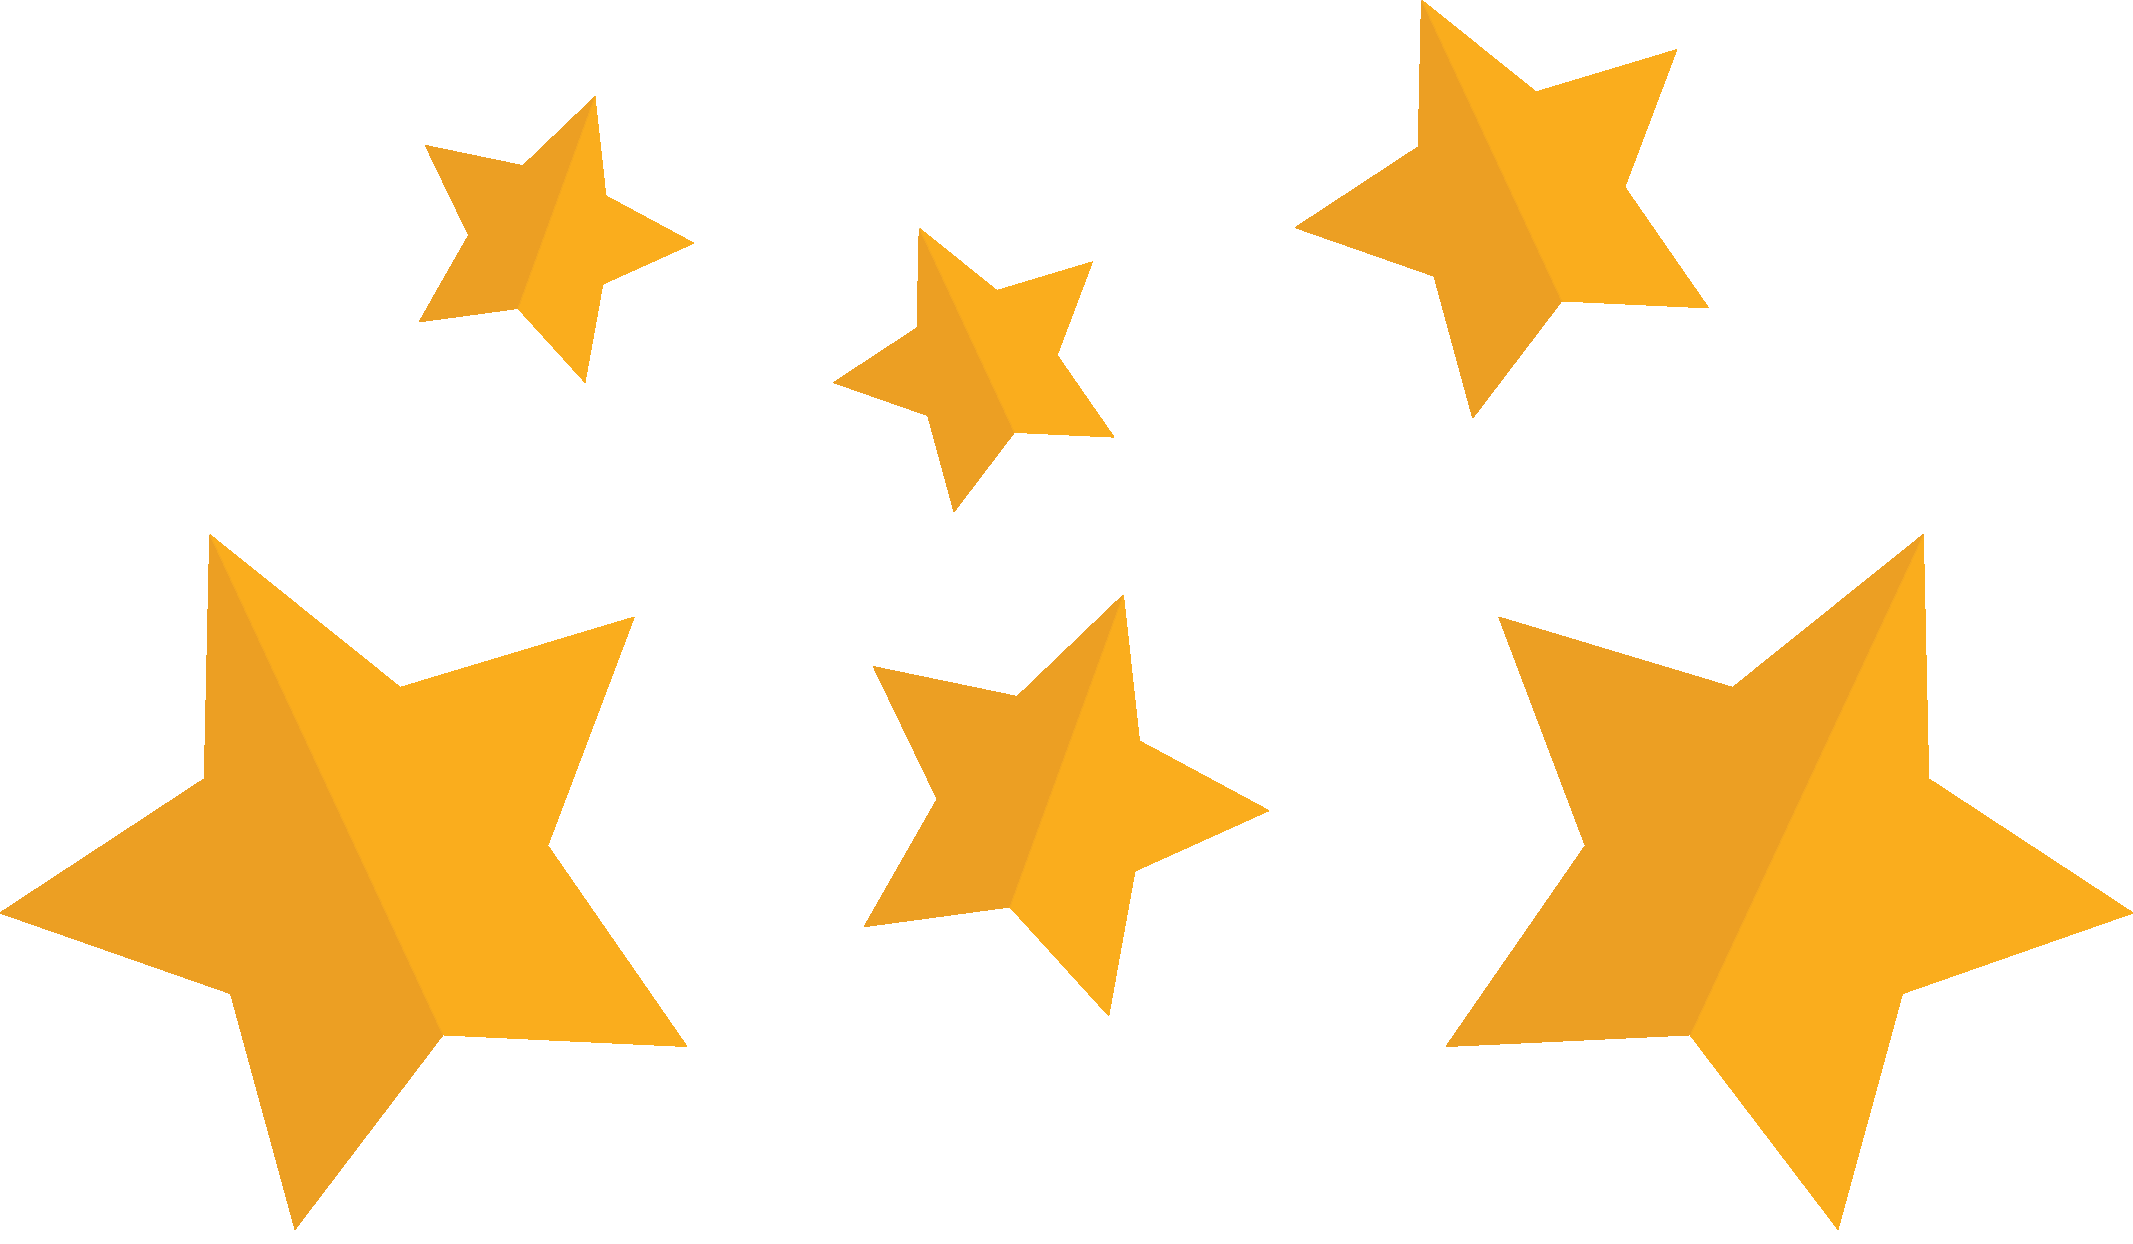 hiw-stars.png PlusPng.com  - Stars PNG